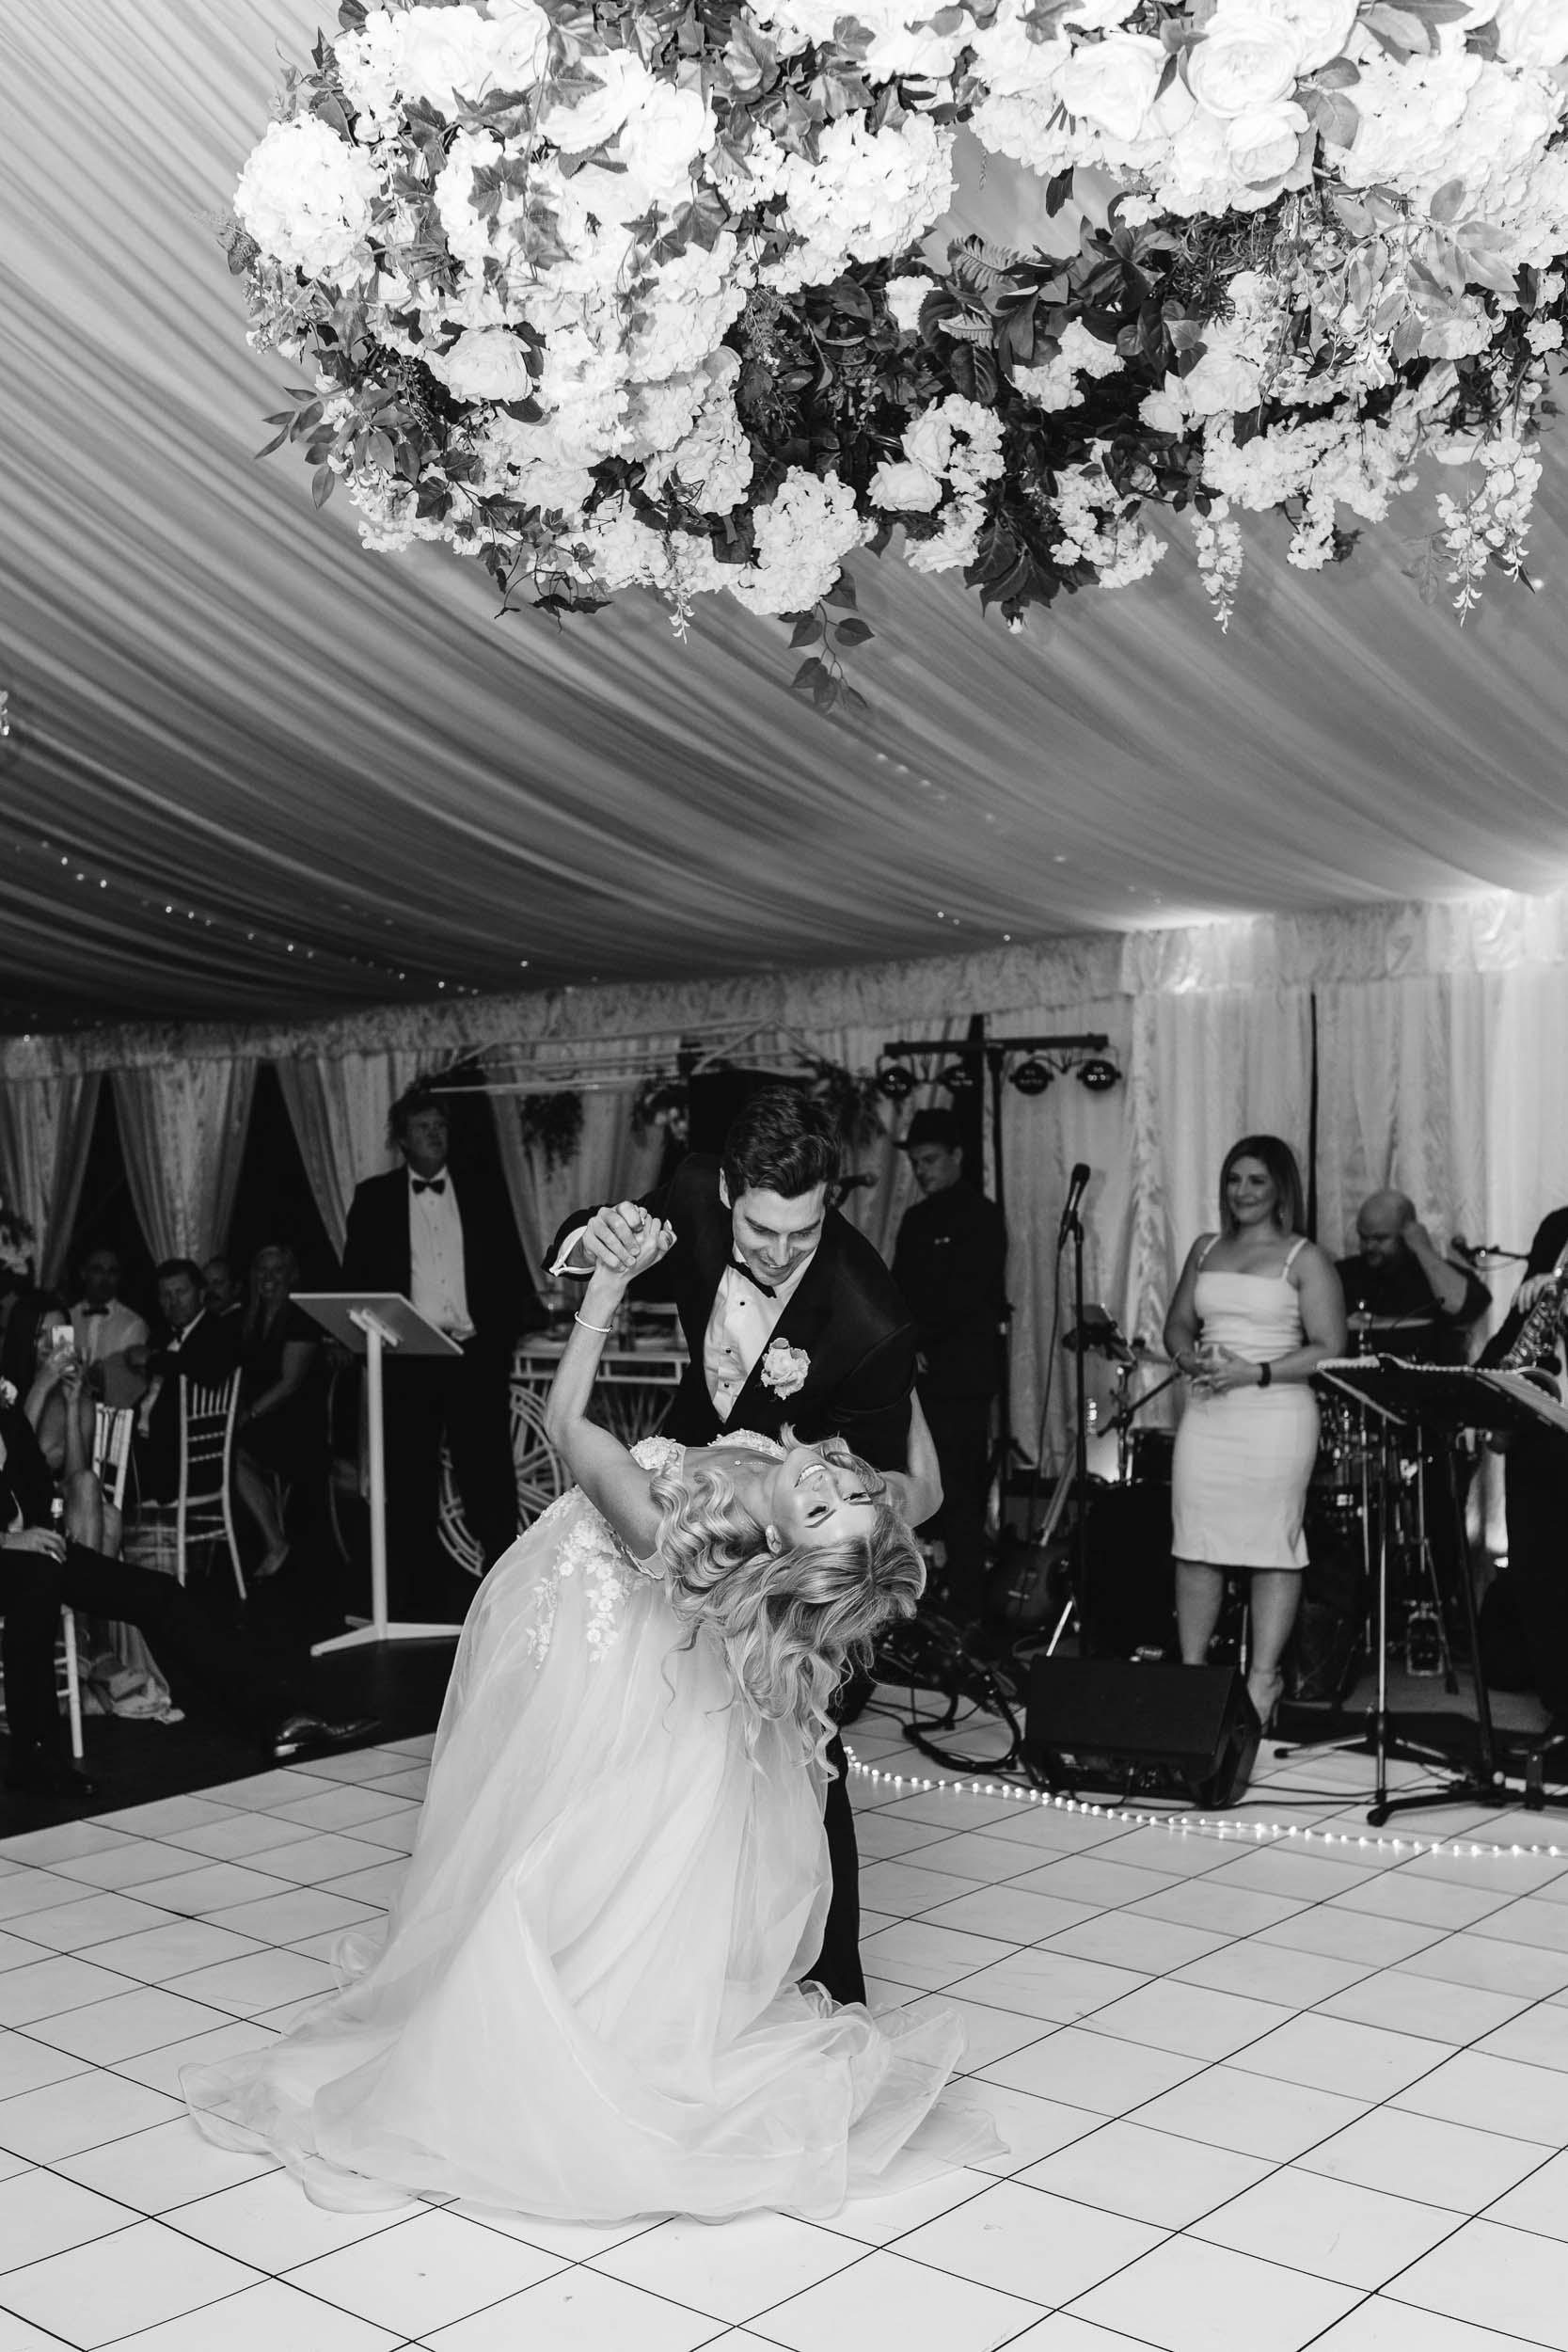 Kas-Richards-Mornington-Peninsula-Private-Property-Wedding-Marianna-Hardwick-Gown-793.jpg